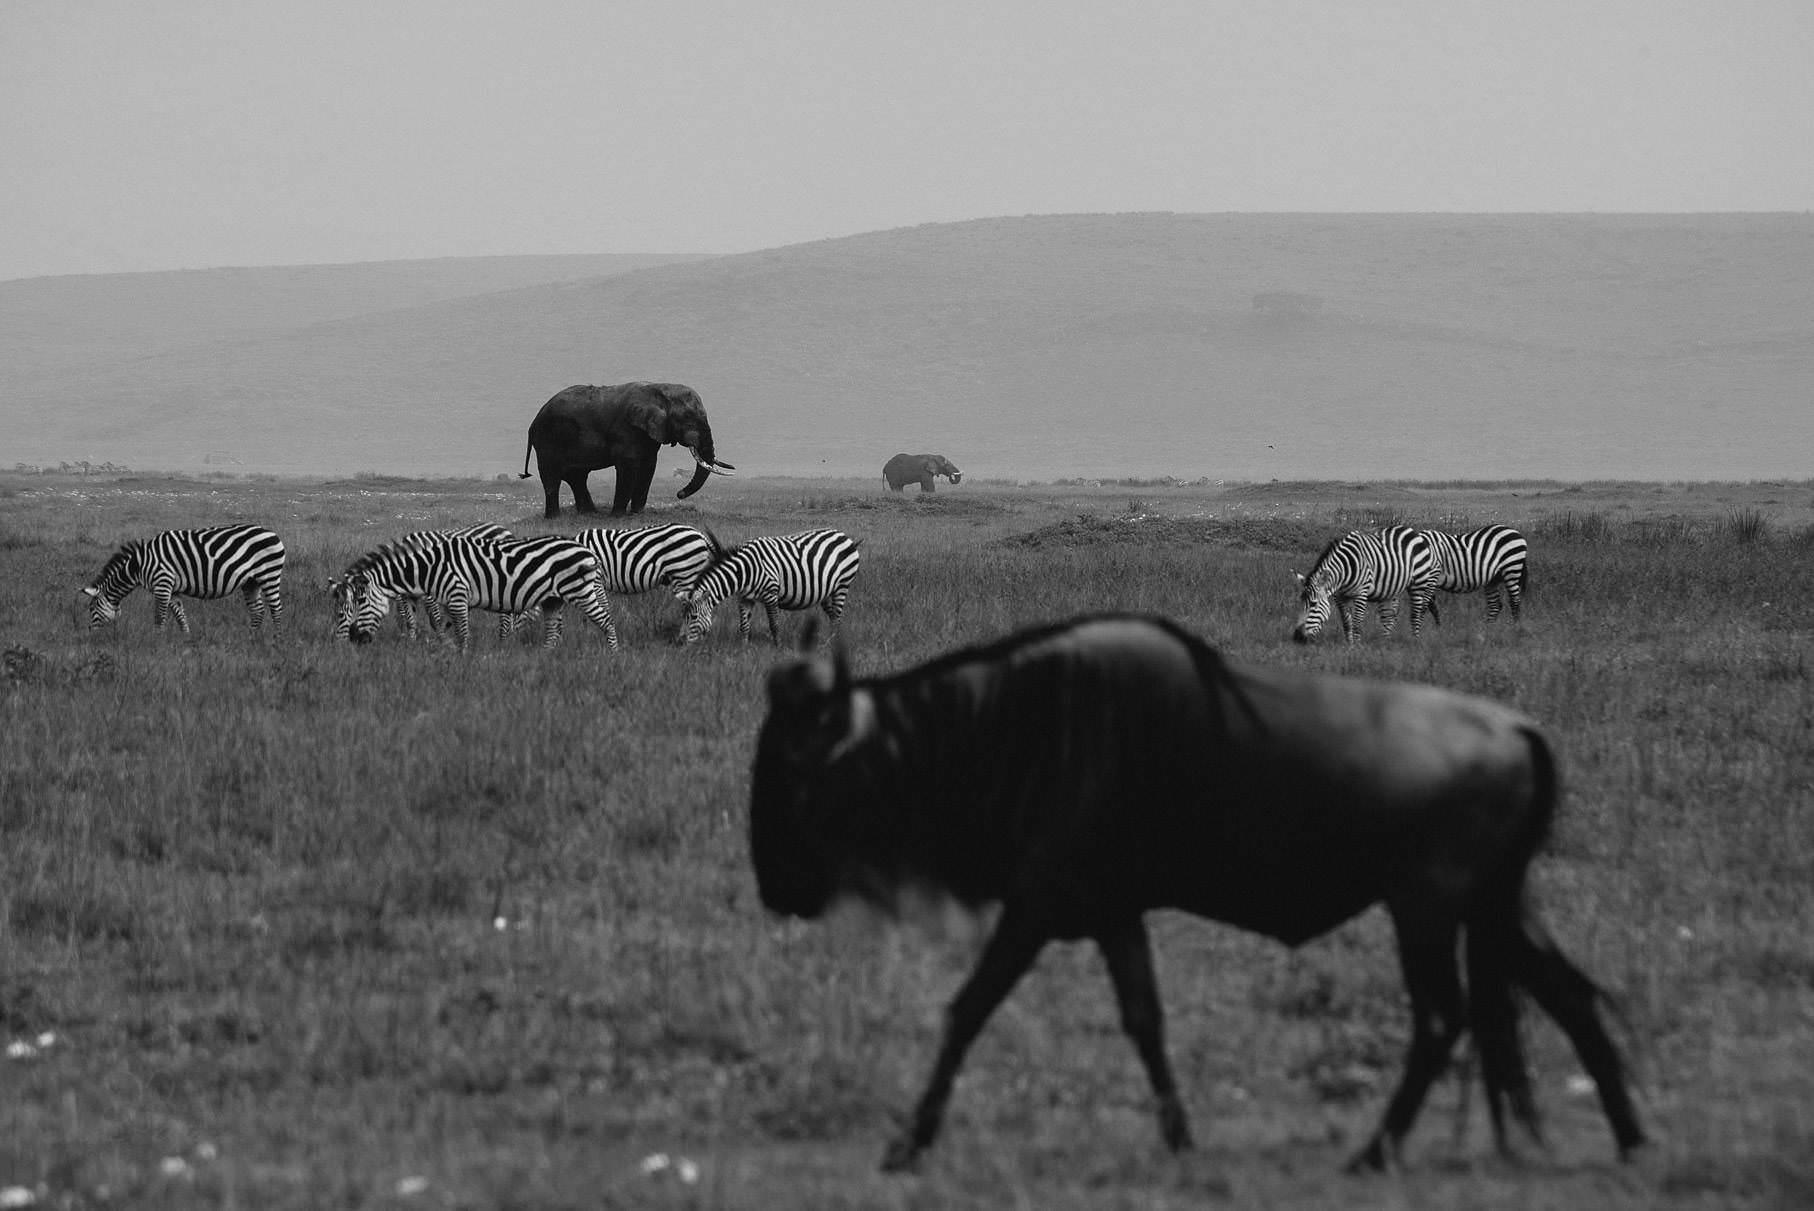 0053 tansania nd8 1535 anne bjoern fotografie hochzeitsfotograf hamburg - This is Tanzania - Serengeti, Kilimanjaro & Sansibar